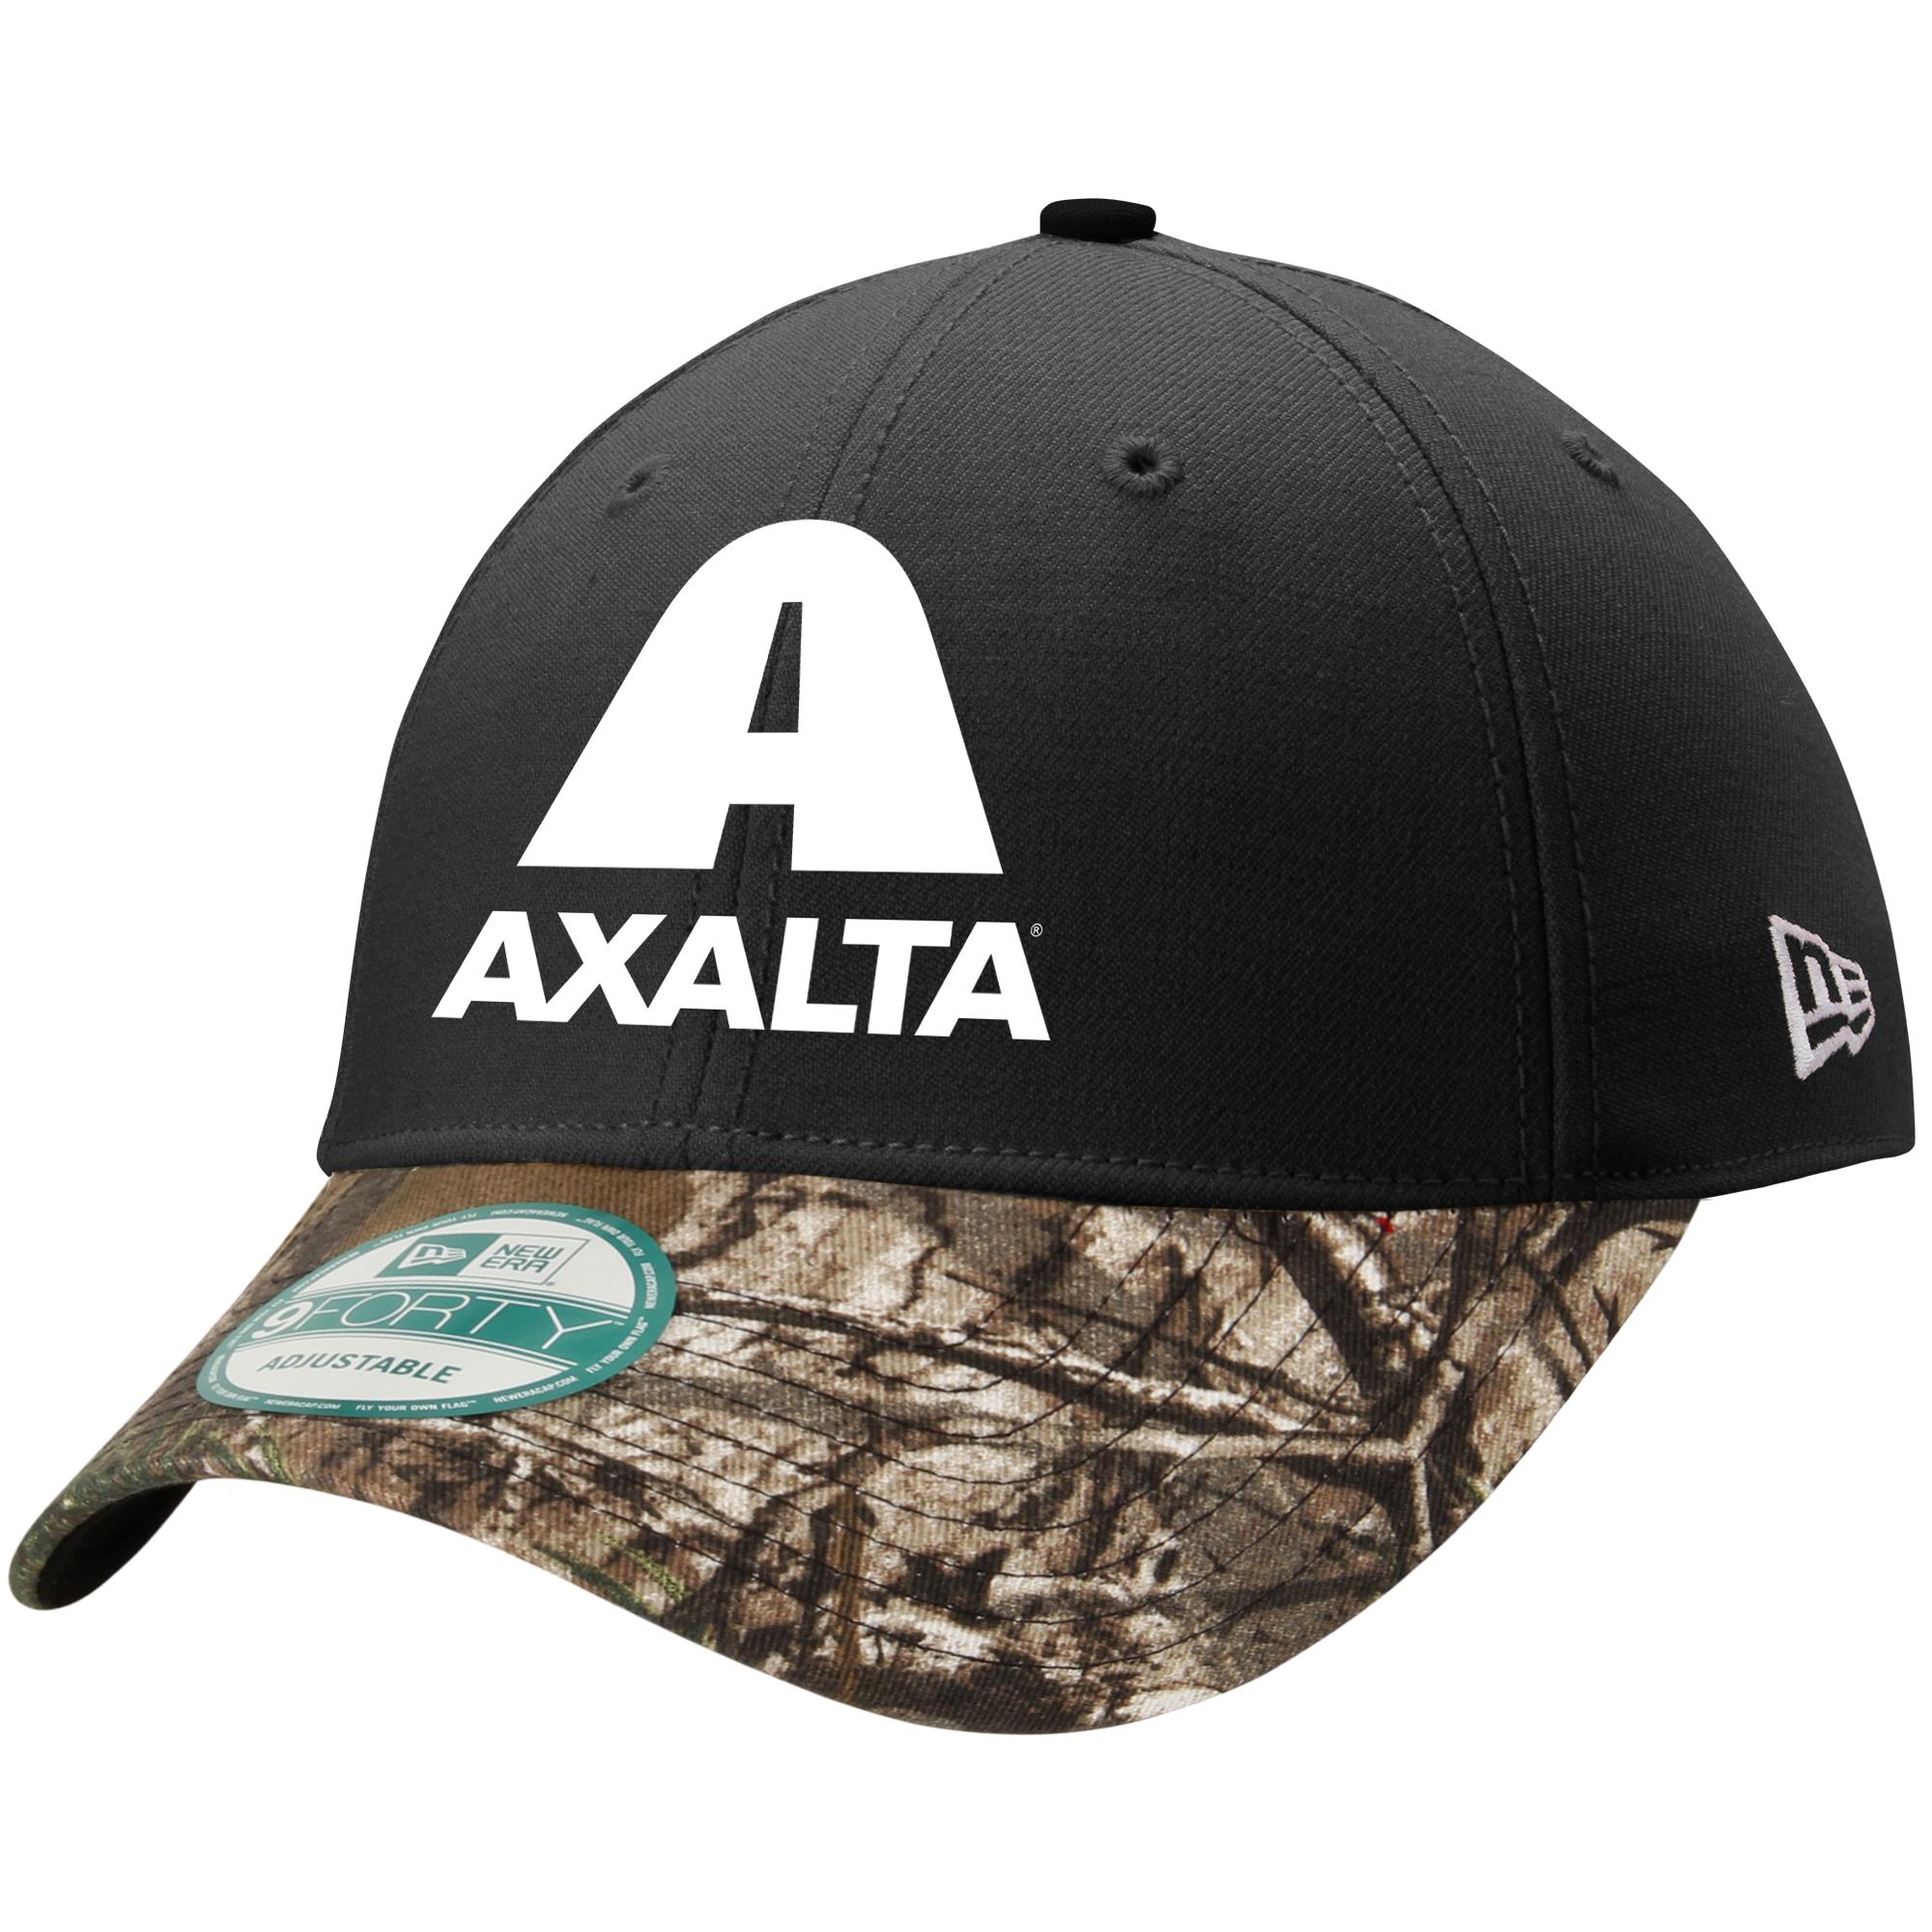 Dale Earnhardt Jr. New Era Axalta Bristol True Timber 9FORTY Adjustable Hat - Black - OSFA